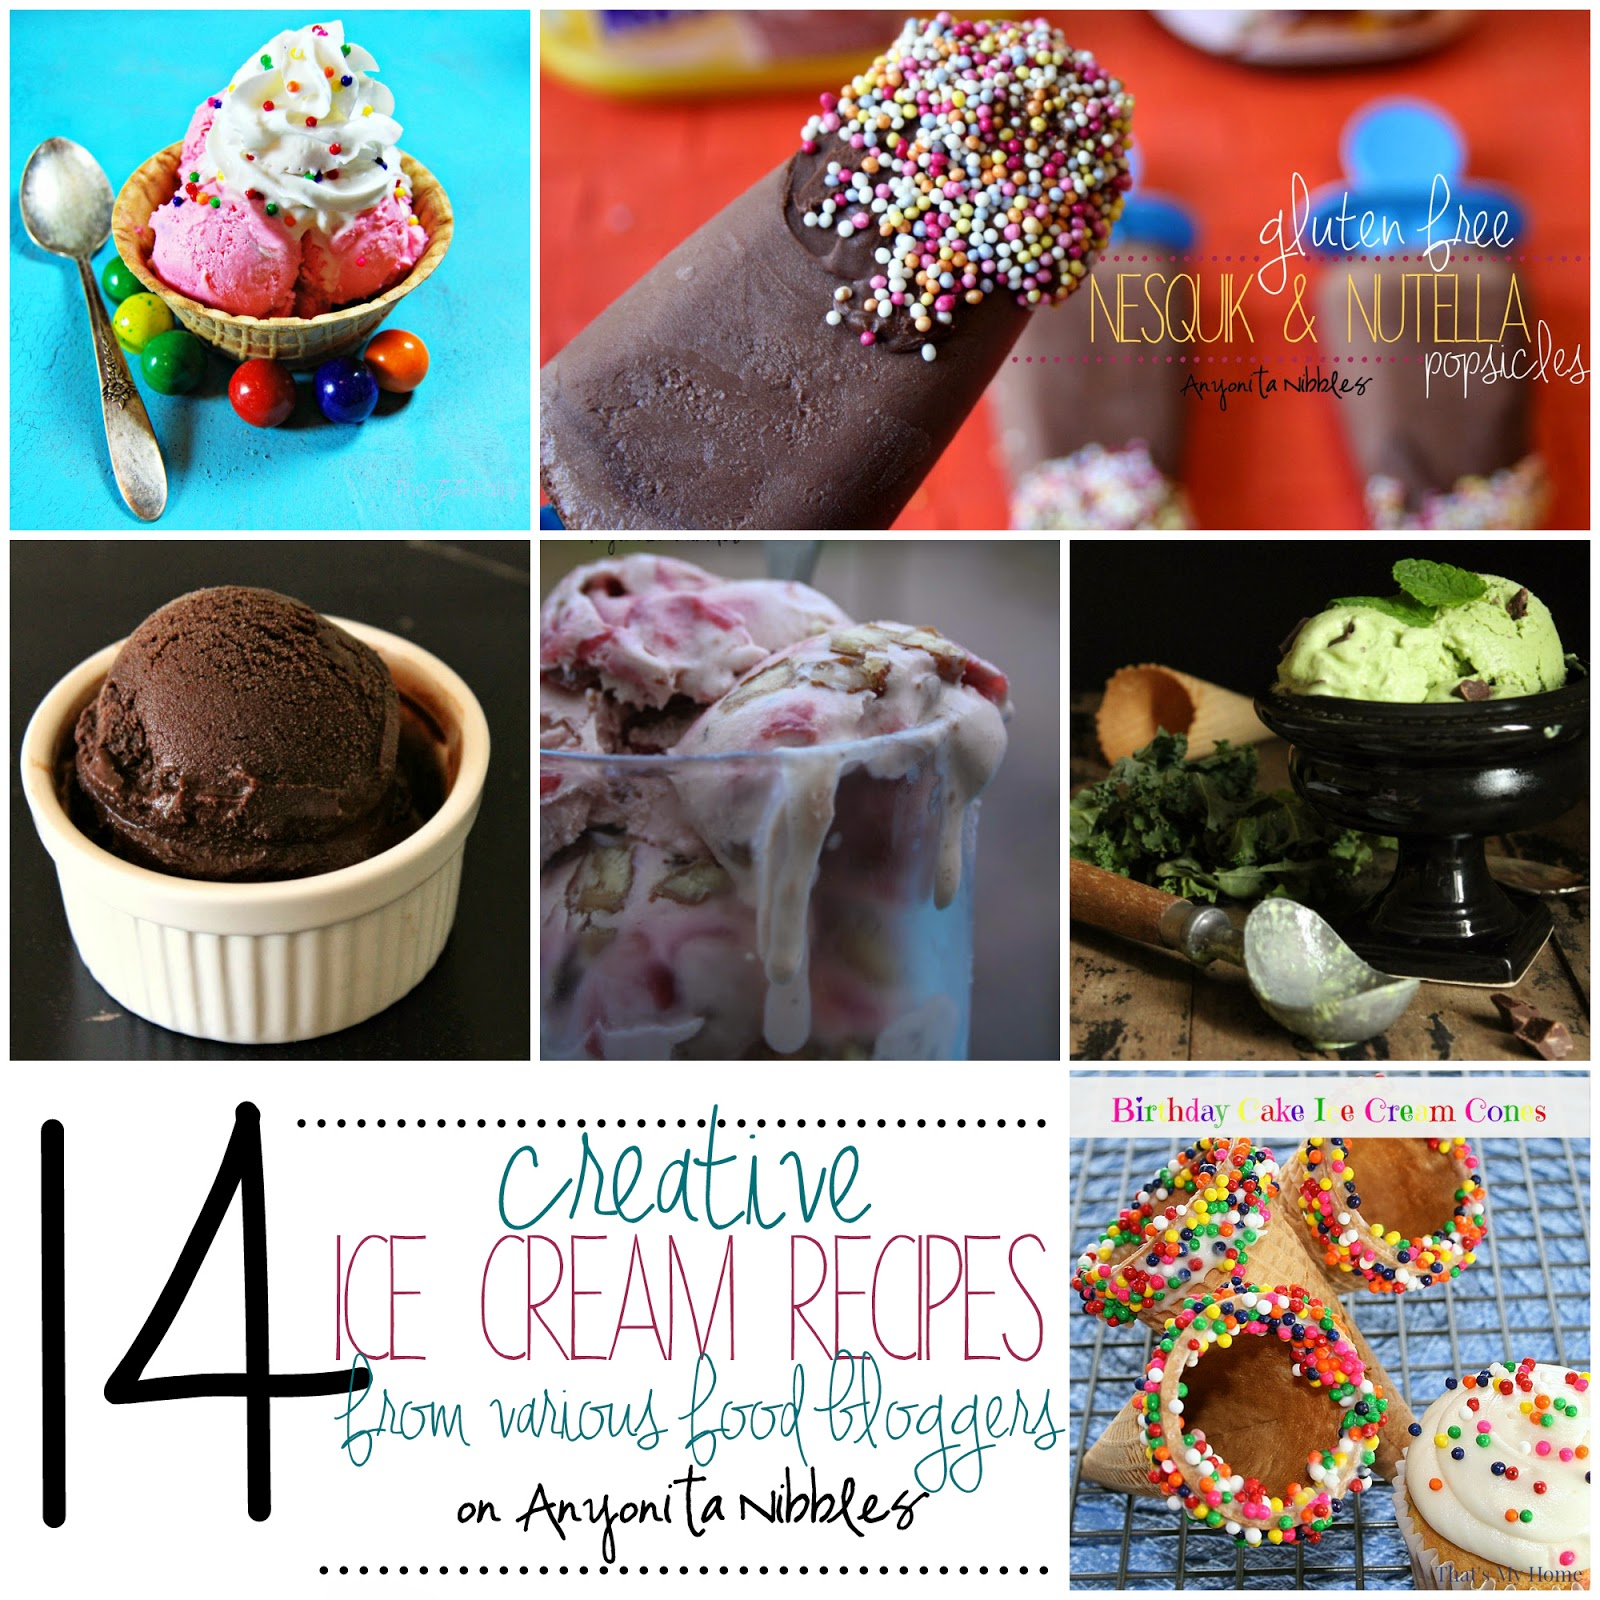 14 Creative Ice Cream Recipes Roundup on Anyonita Nibbles